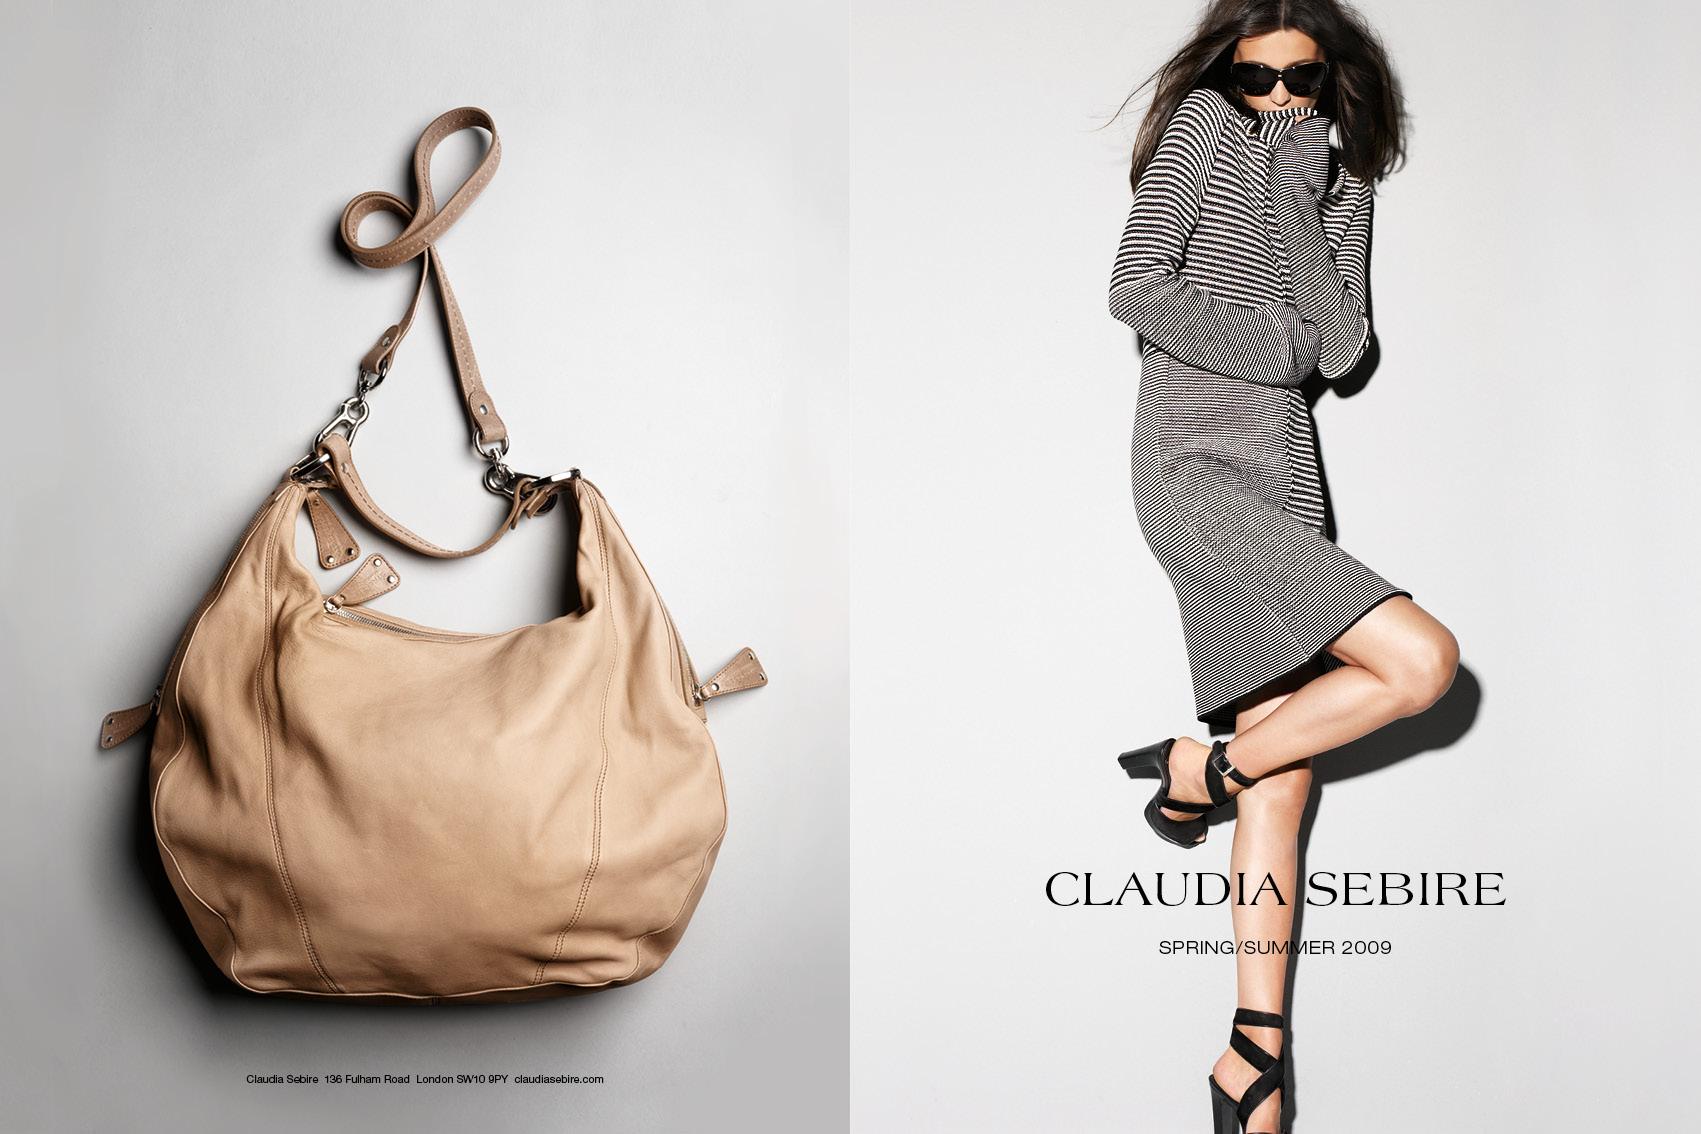 Claudia Sebire